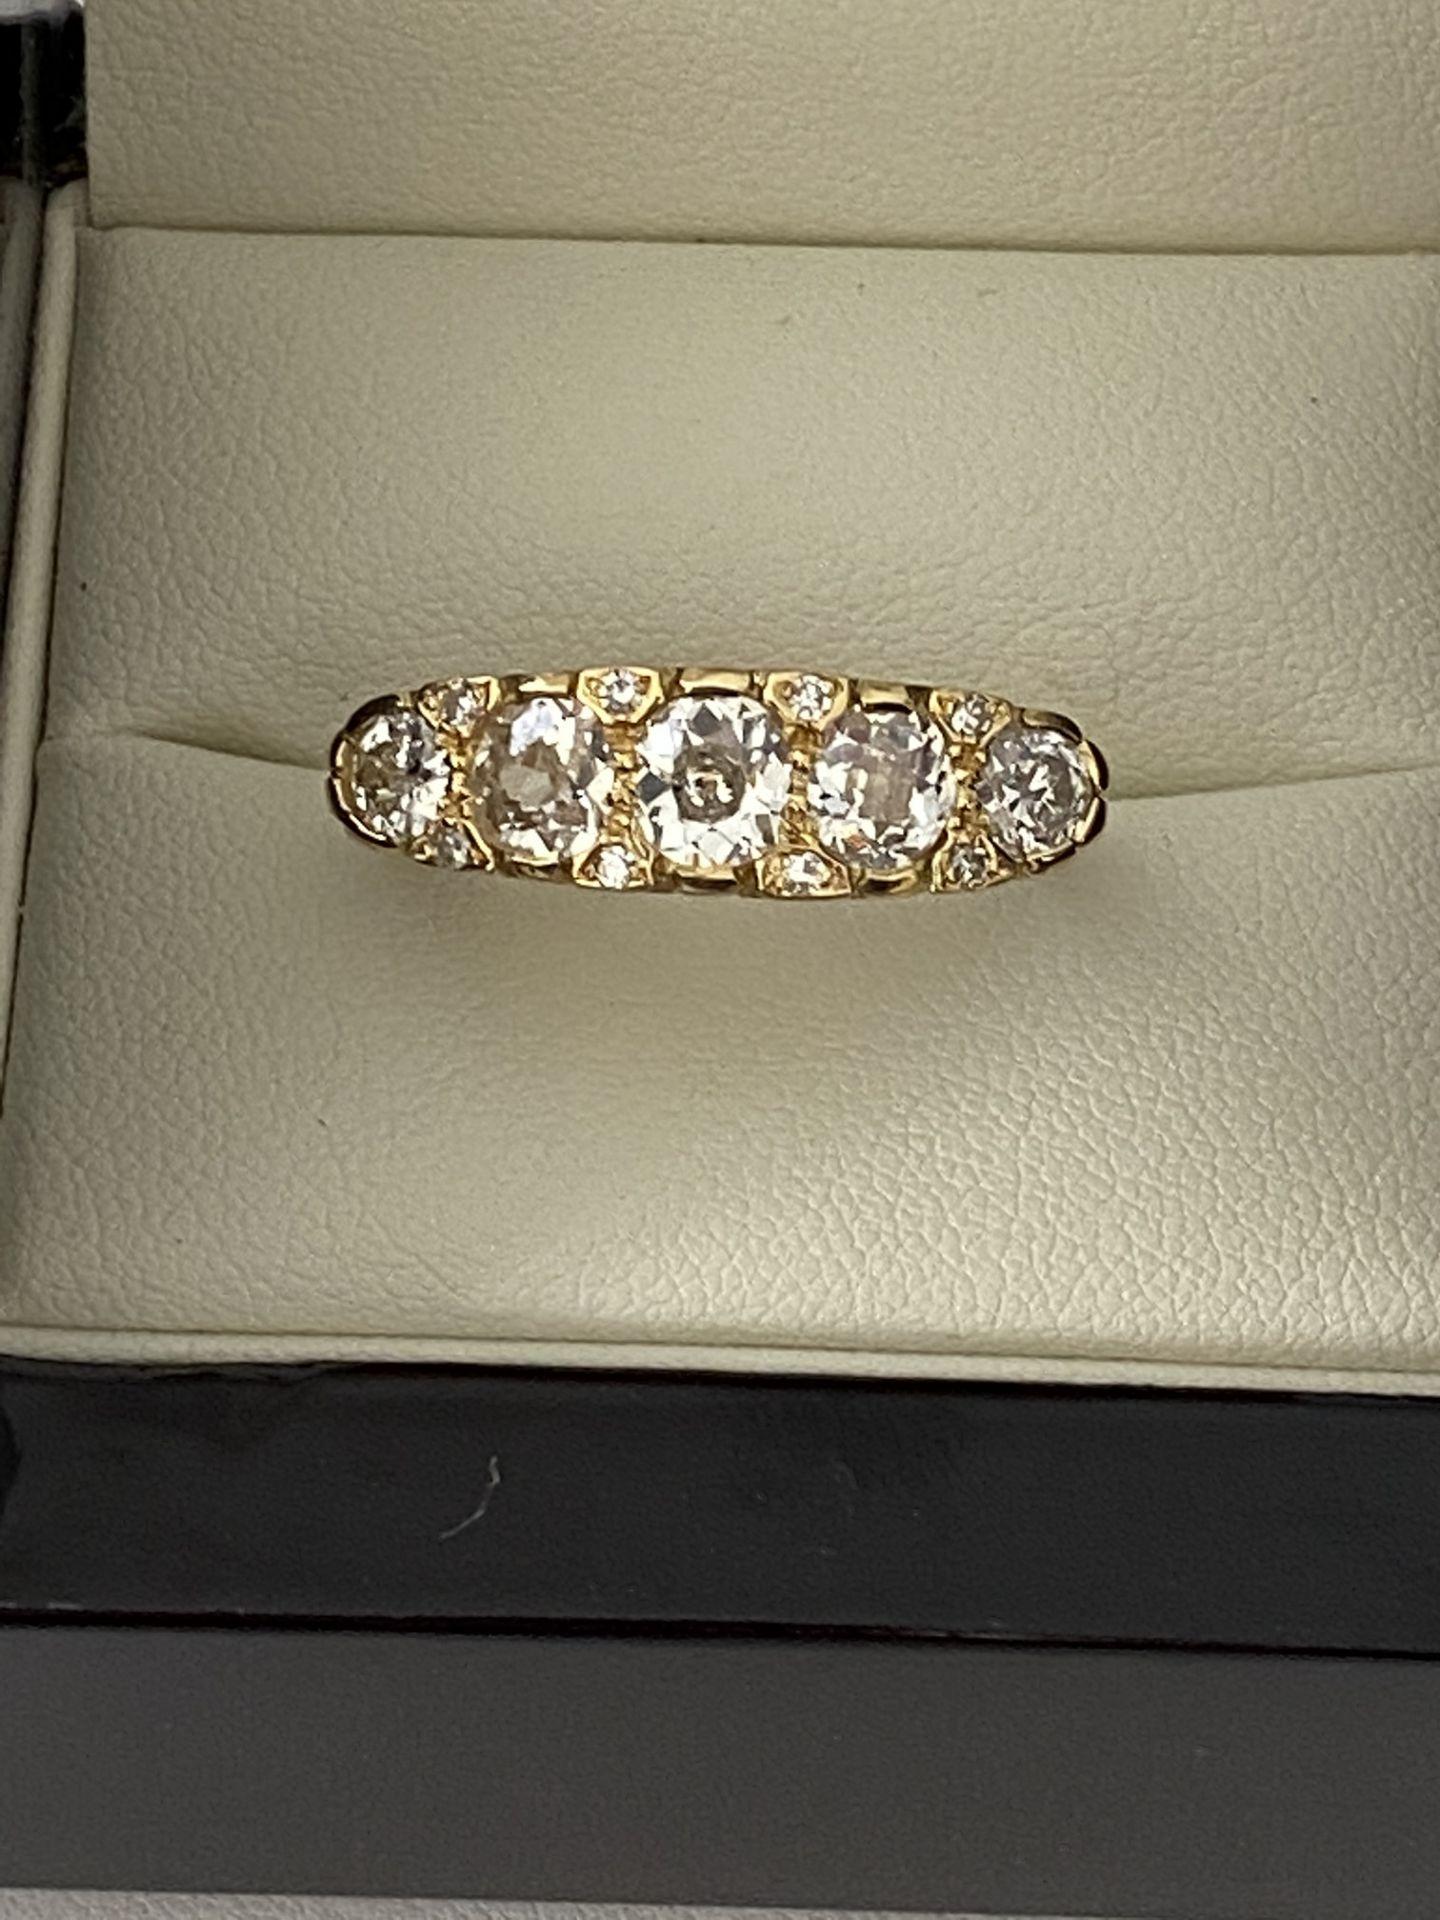 FINE 18ct YELLOW GOLD 2.00ct 5 STONE DIAMOND RING - Image 5 of 15